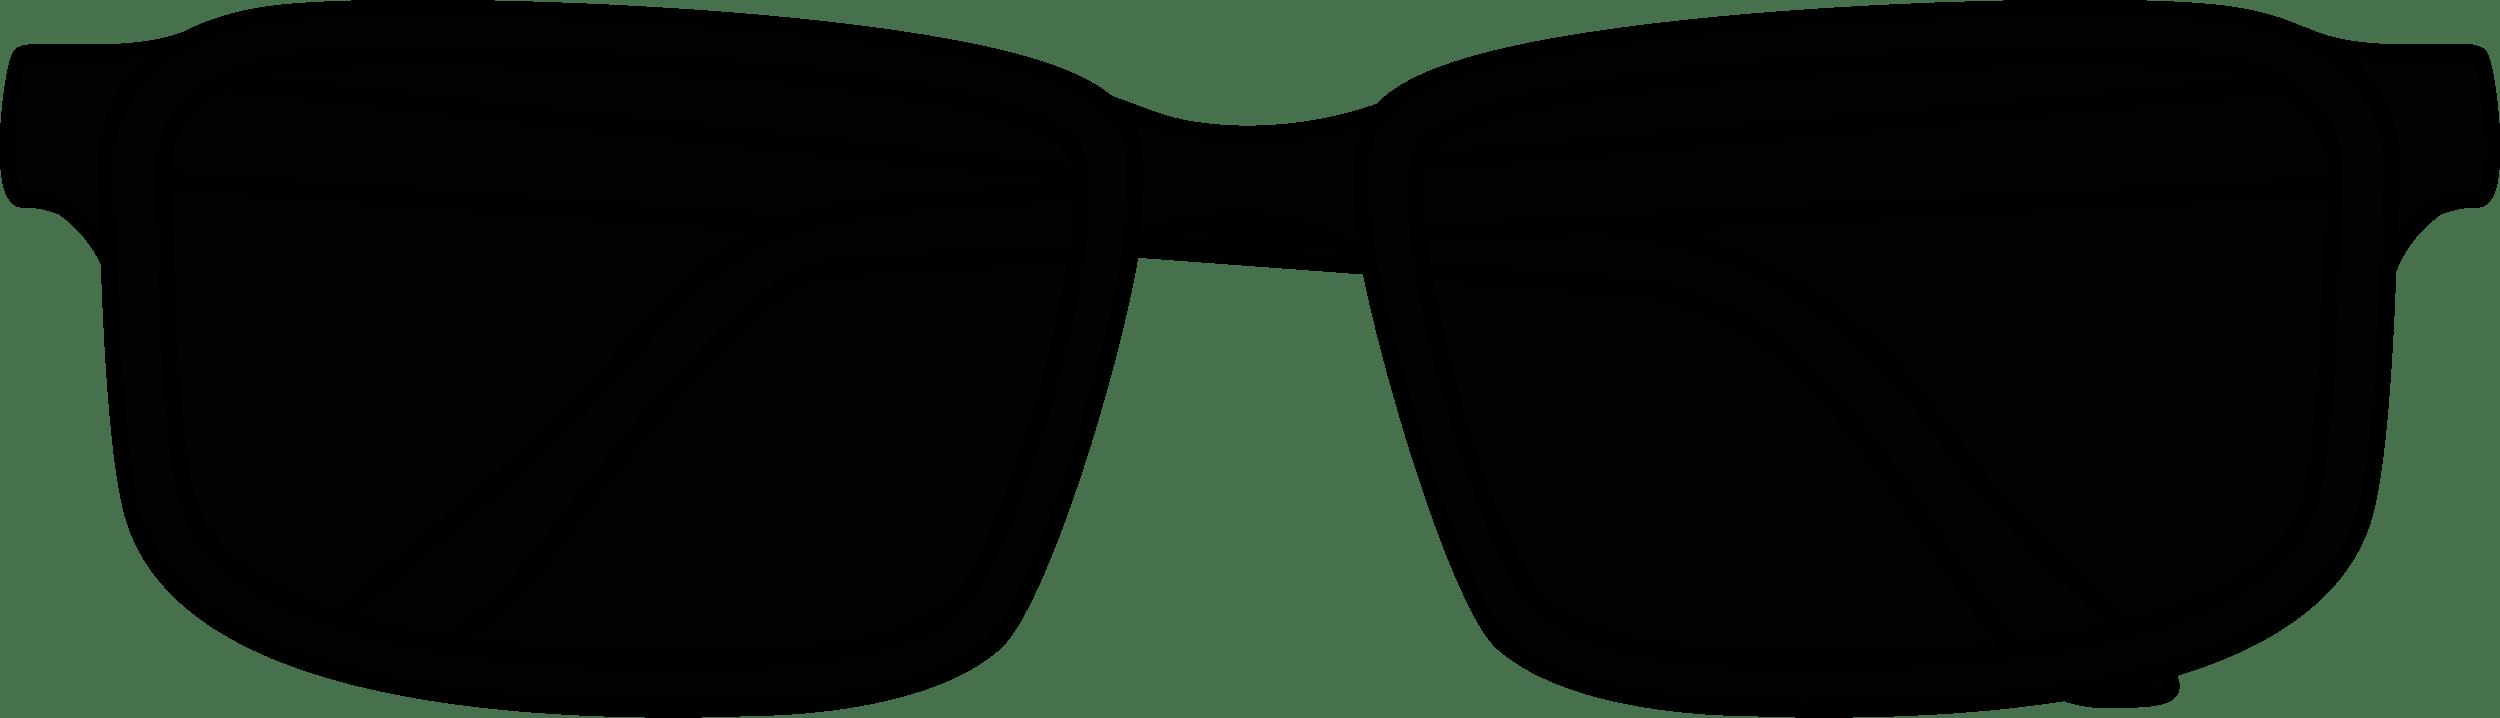 Men Sunglasses PNG 5